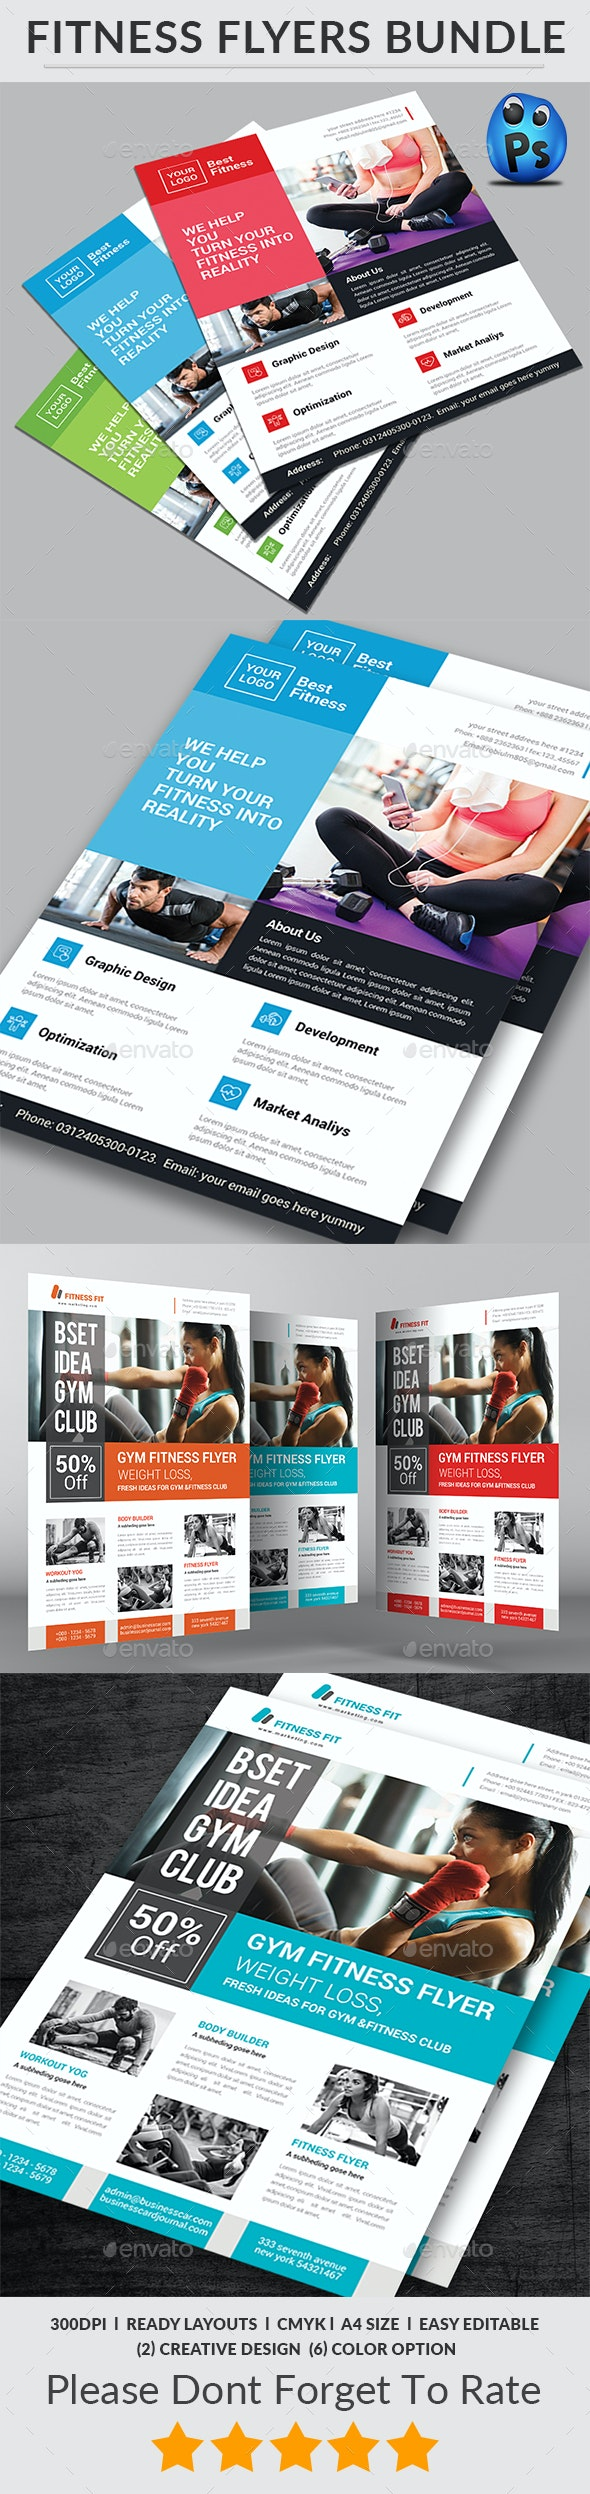 Fitness Flyers Bundle Print Templates - Corporate Flyers